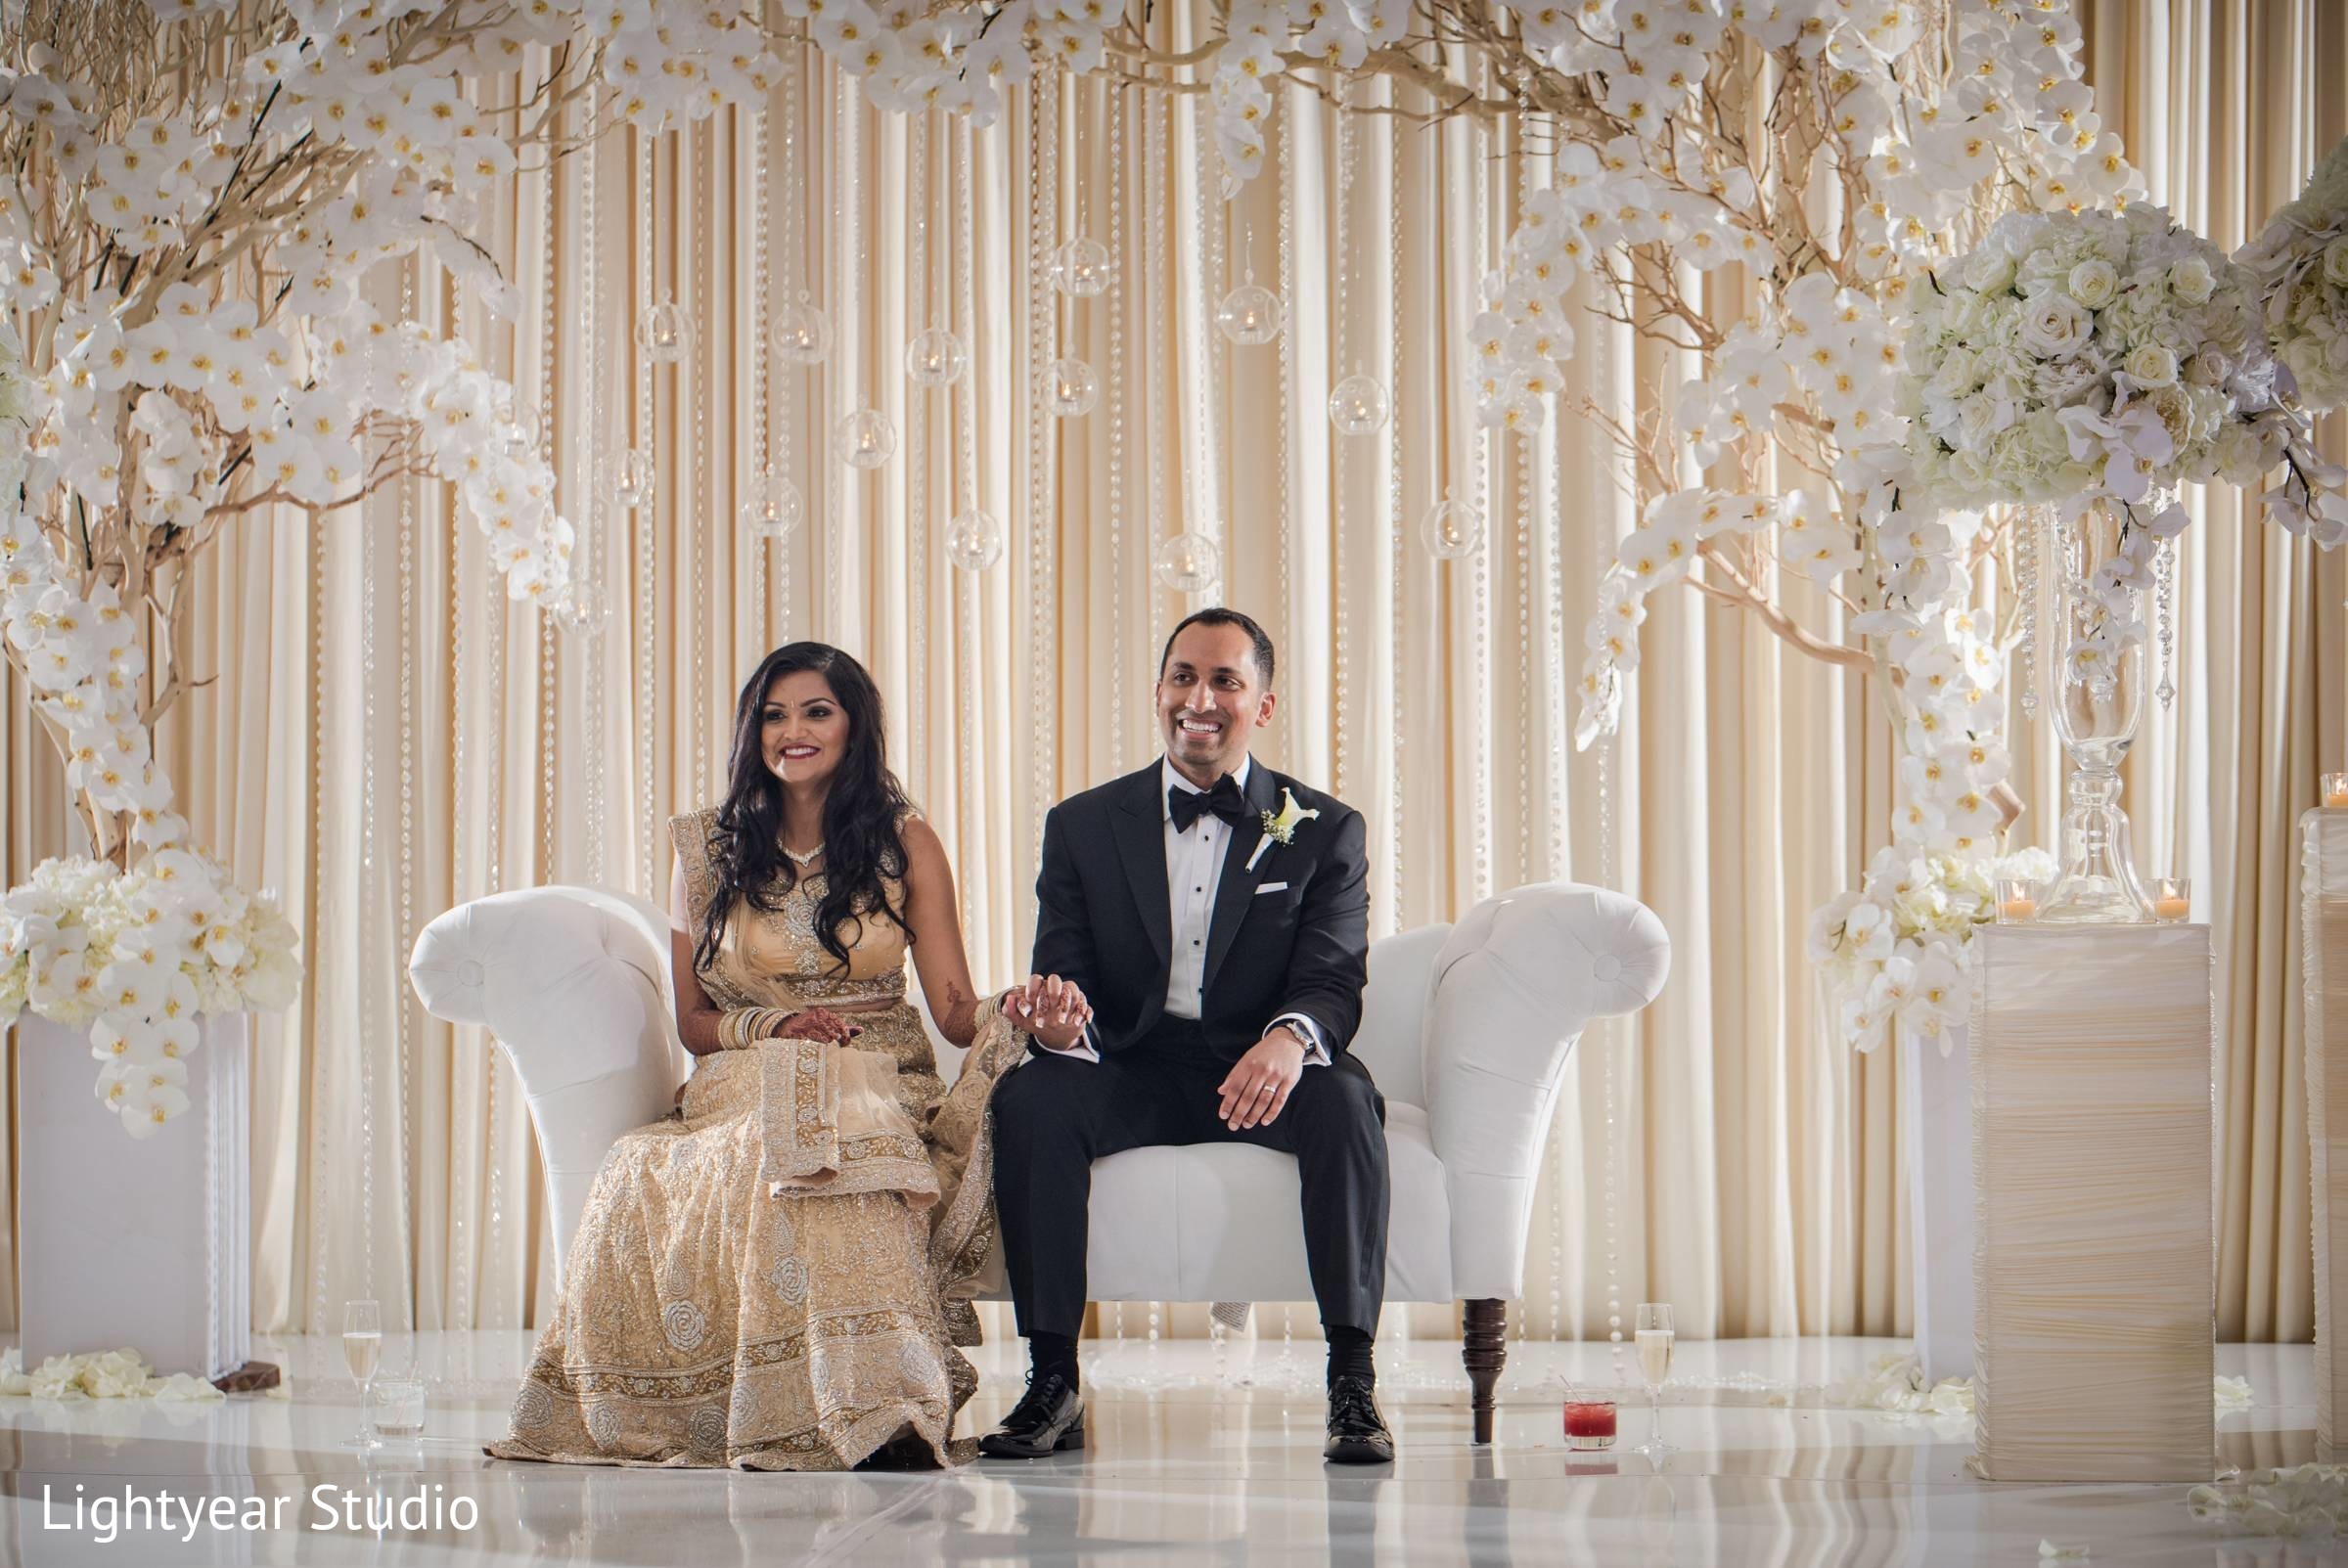 Whippany, NJ Indian Wedding by Lightyear Studio